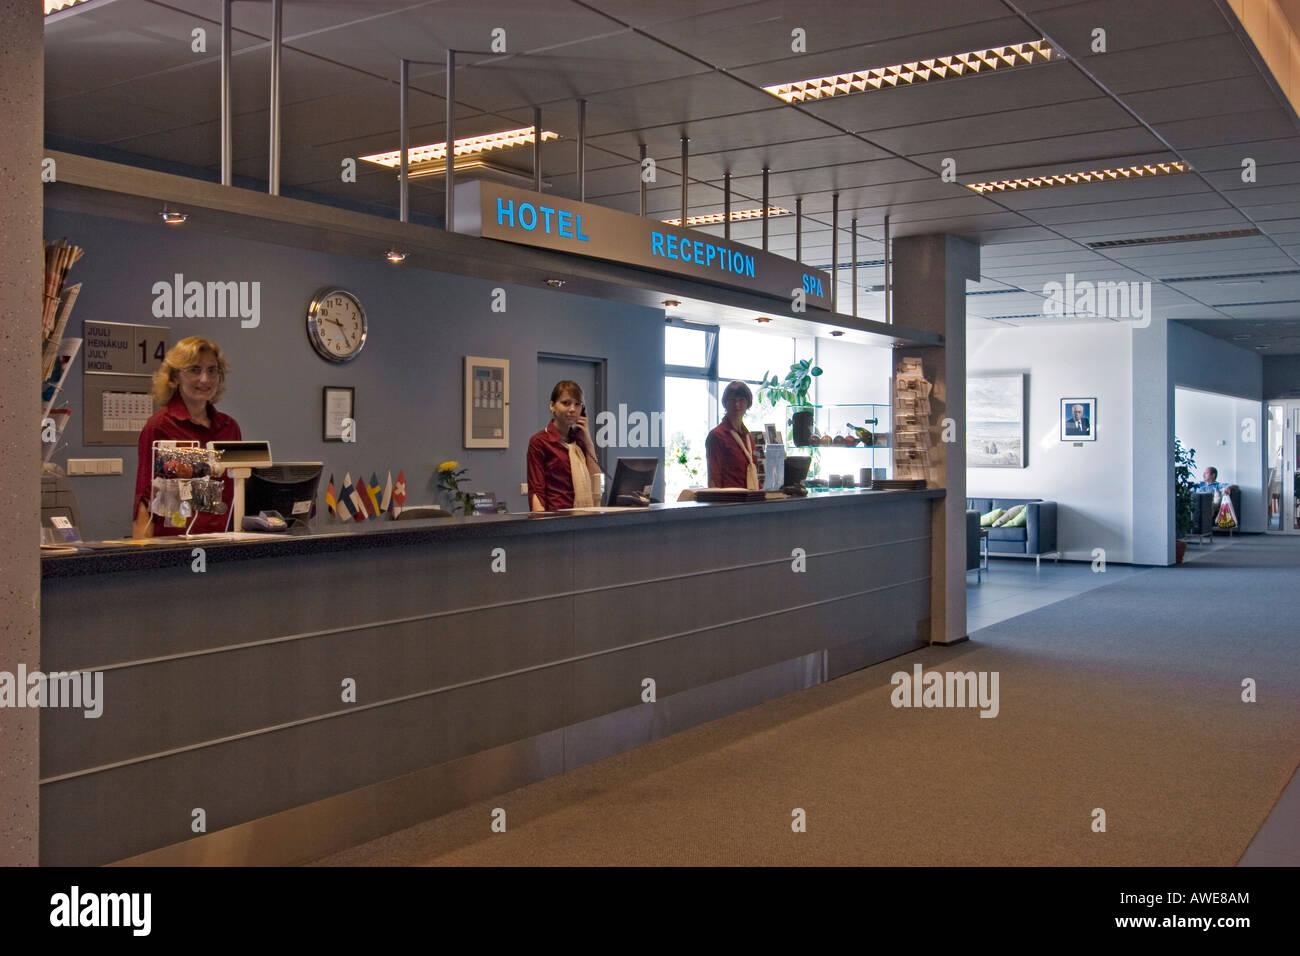 Lobby, Hotel Meri, Kuressaare, Saaremaa Island, Estonia, Europe Stock Photo